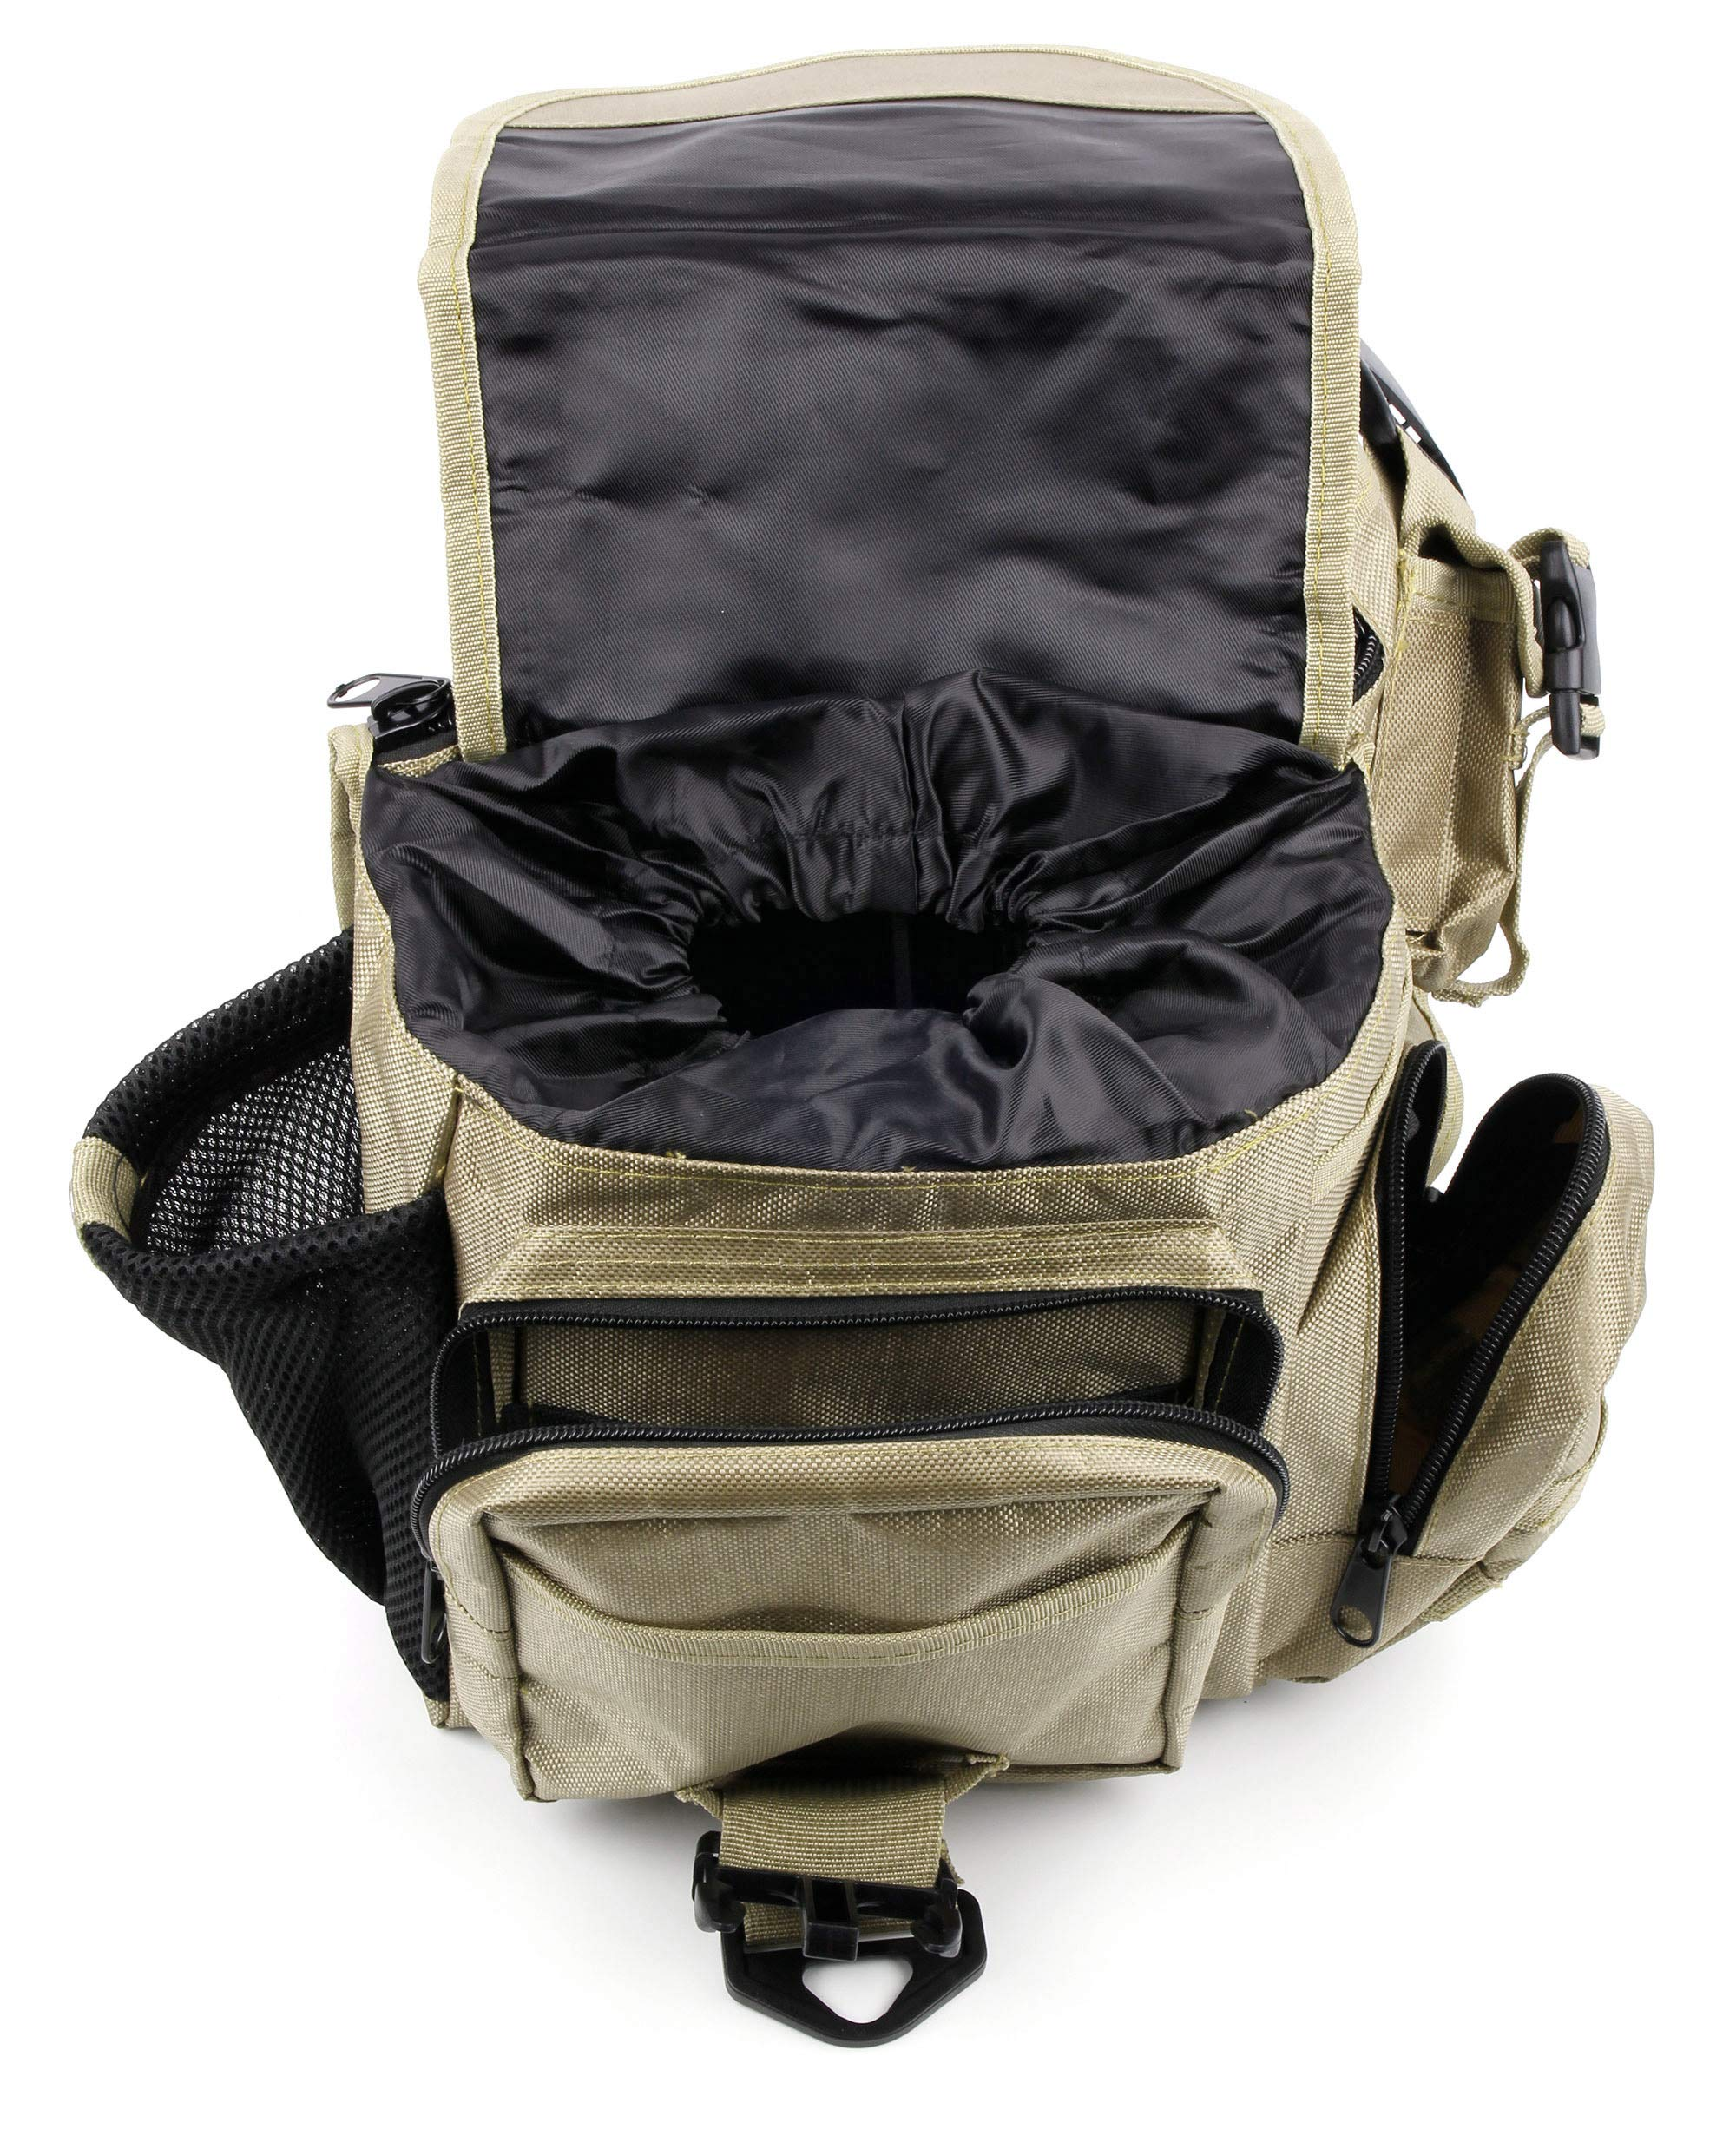 f937a24e4b8b ایگرد - خرید از آمازون | DURAGADGET Tactical Khaki Camera Bag with ...